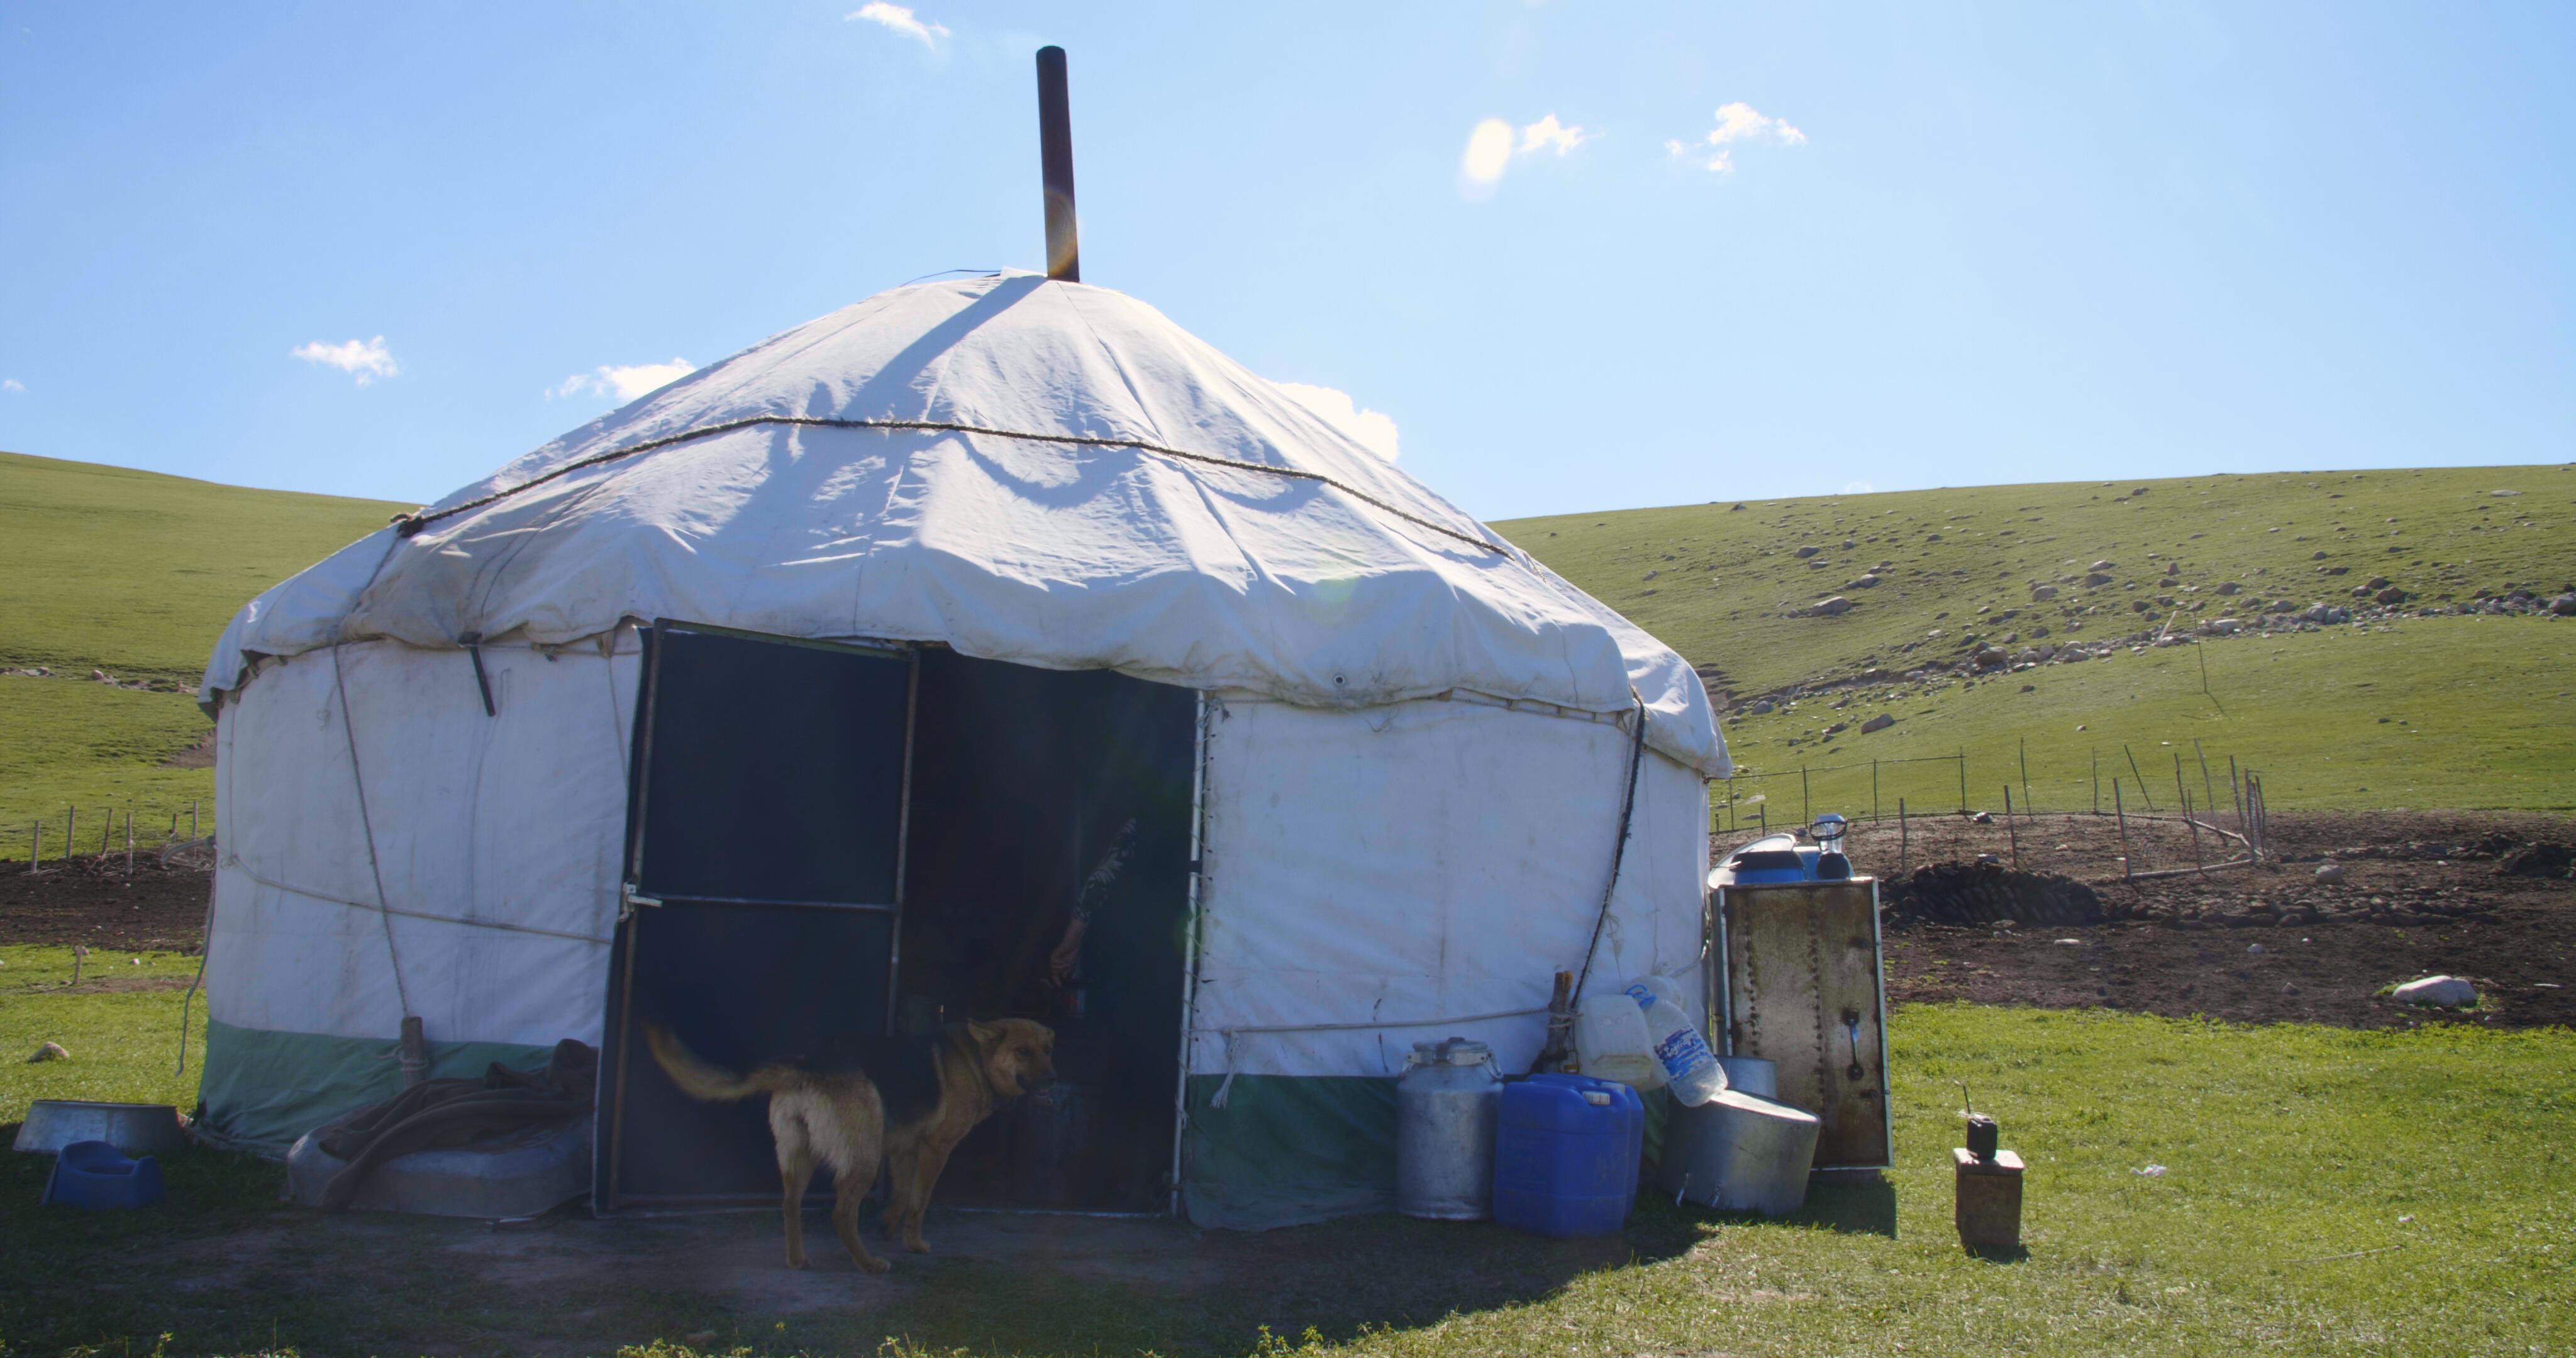 TheBoyFromKyrgyzstan_Stills_1.28.1